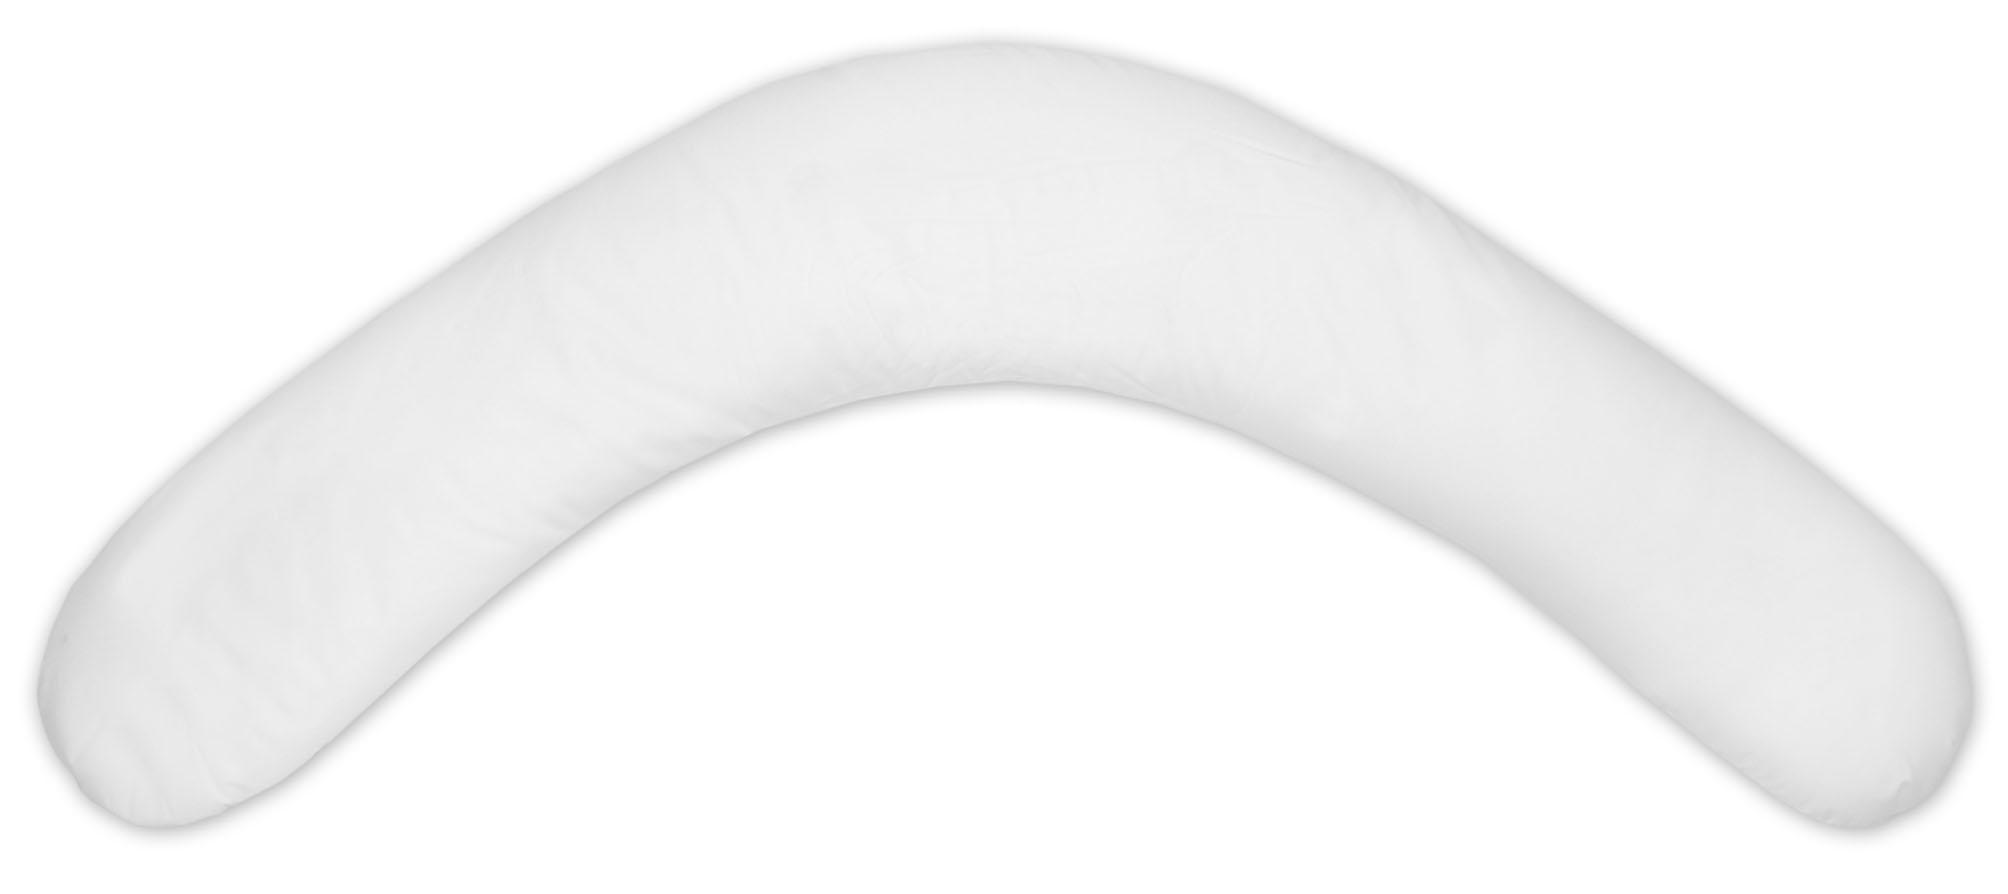 Theraline 51070158 - Cojín de lactancia deluxe (color blanco)